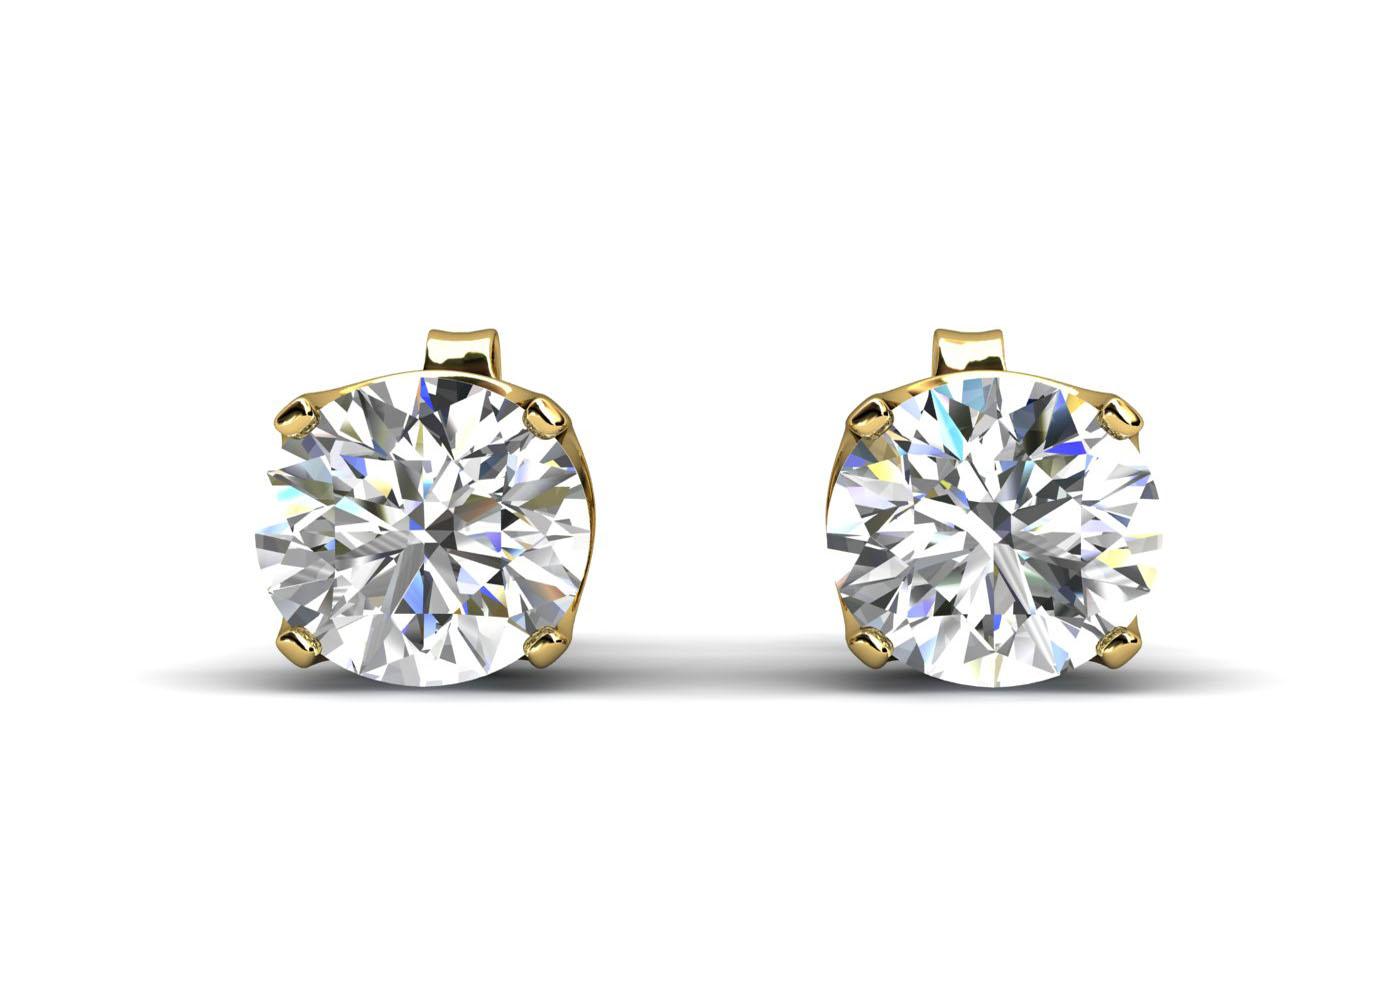 9ct Claw Set Diamond Earrings 0.15 Carats